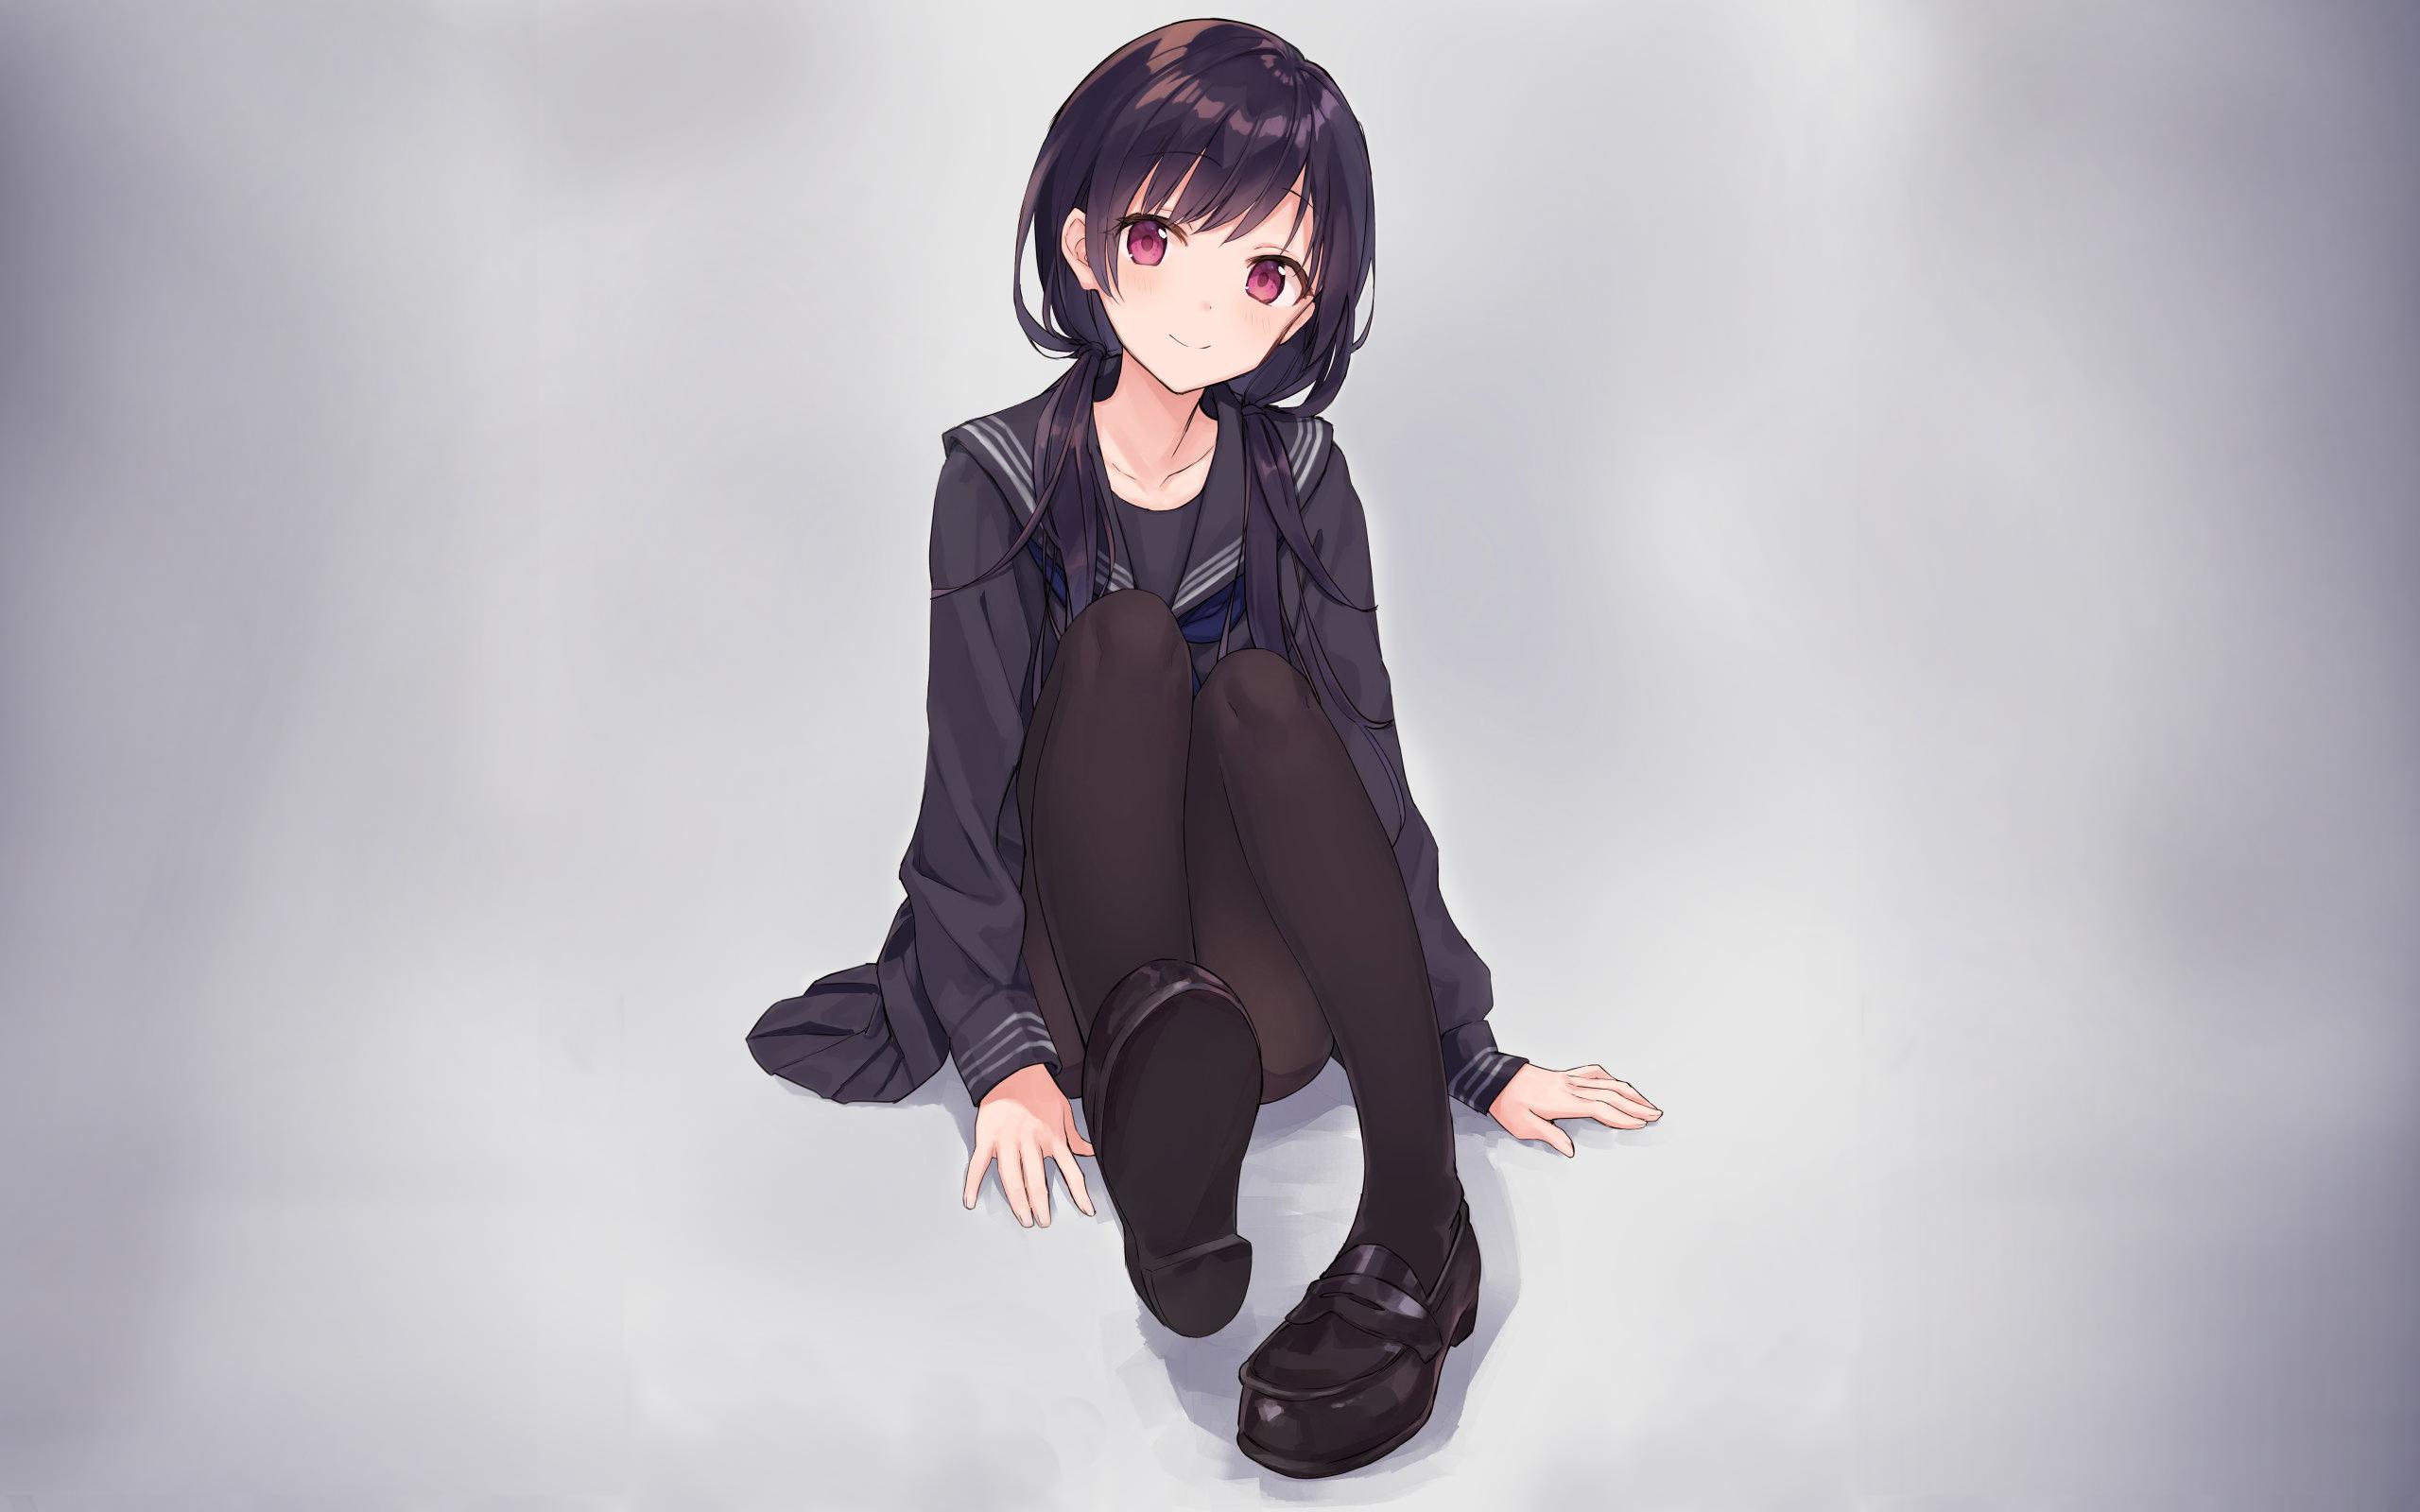 Wallpaper School Uniform Simple Background Black Hair Anime